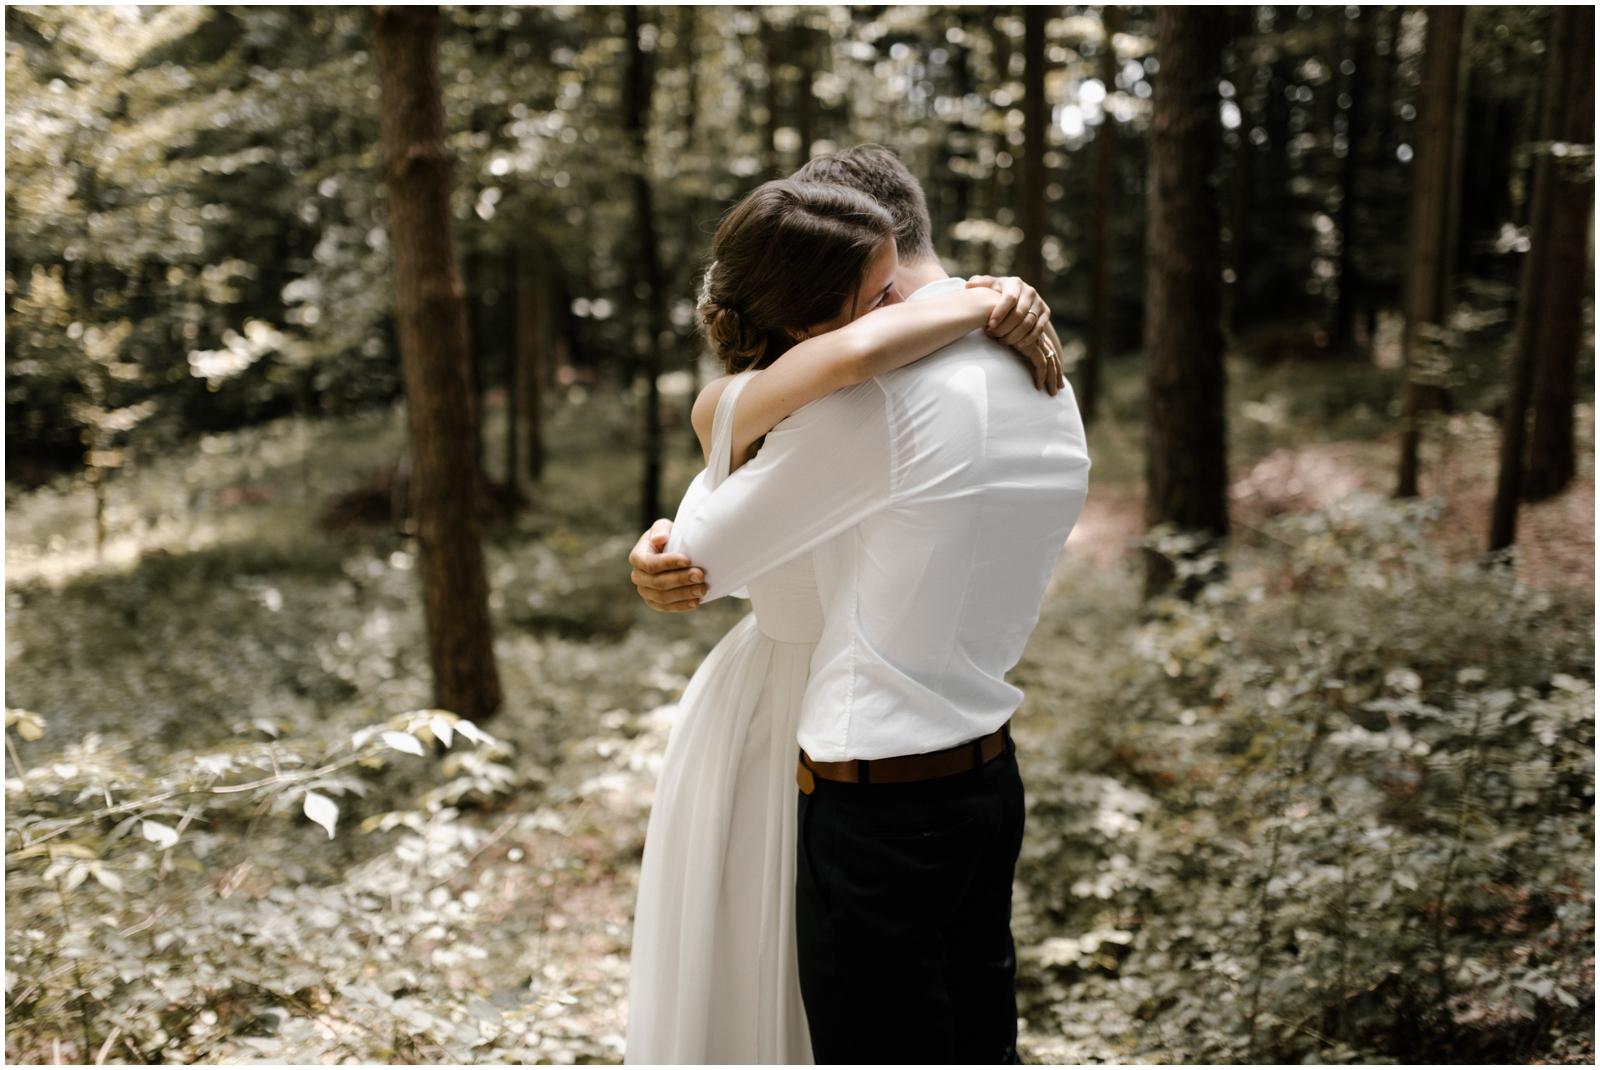 mirjam_thomas_wedding-258.jpg